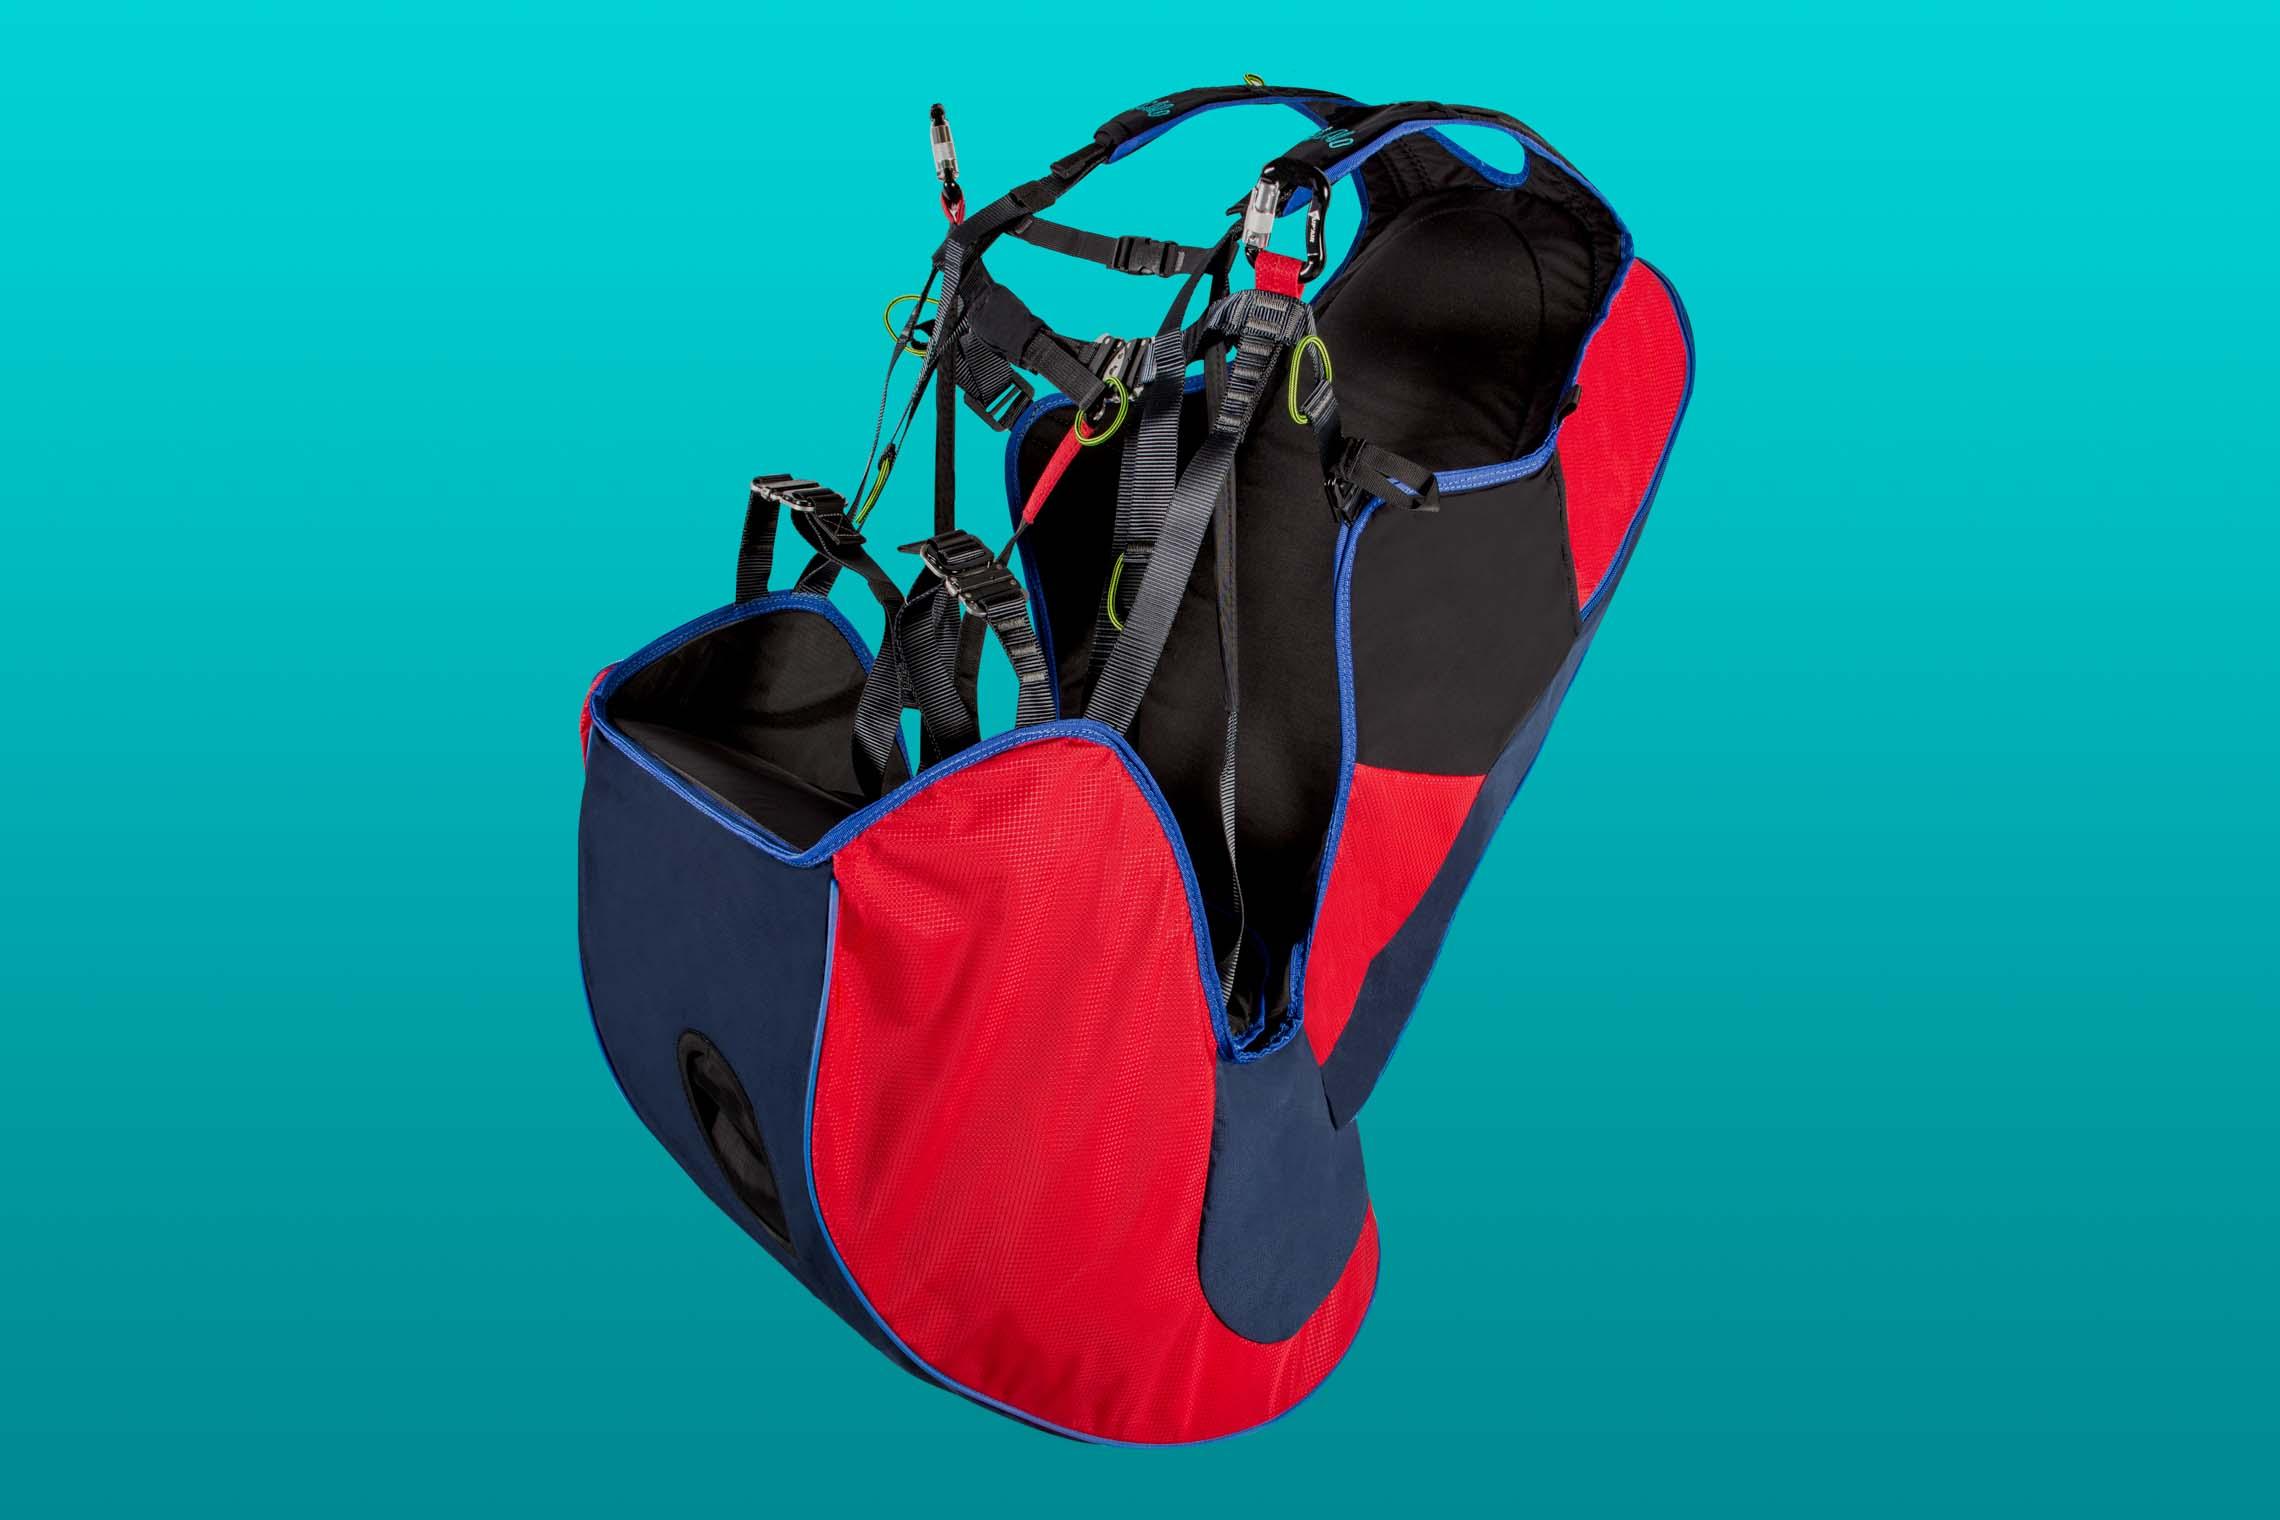 Icaro Batis Tandem Passenger Harness